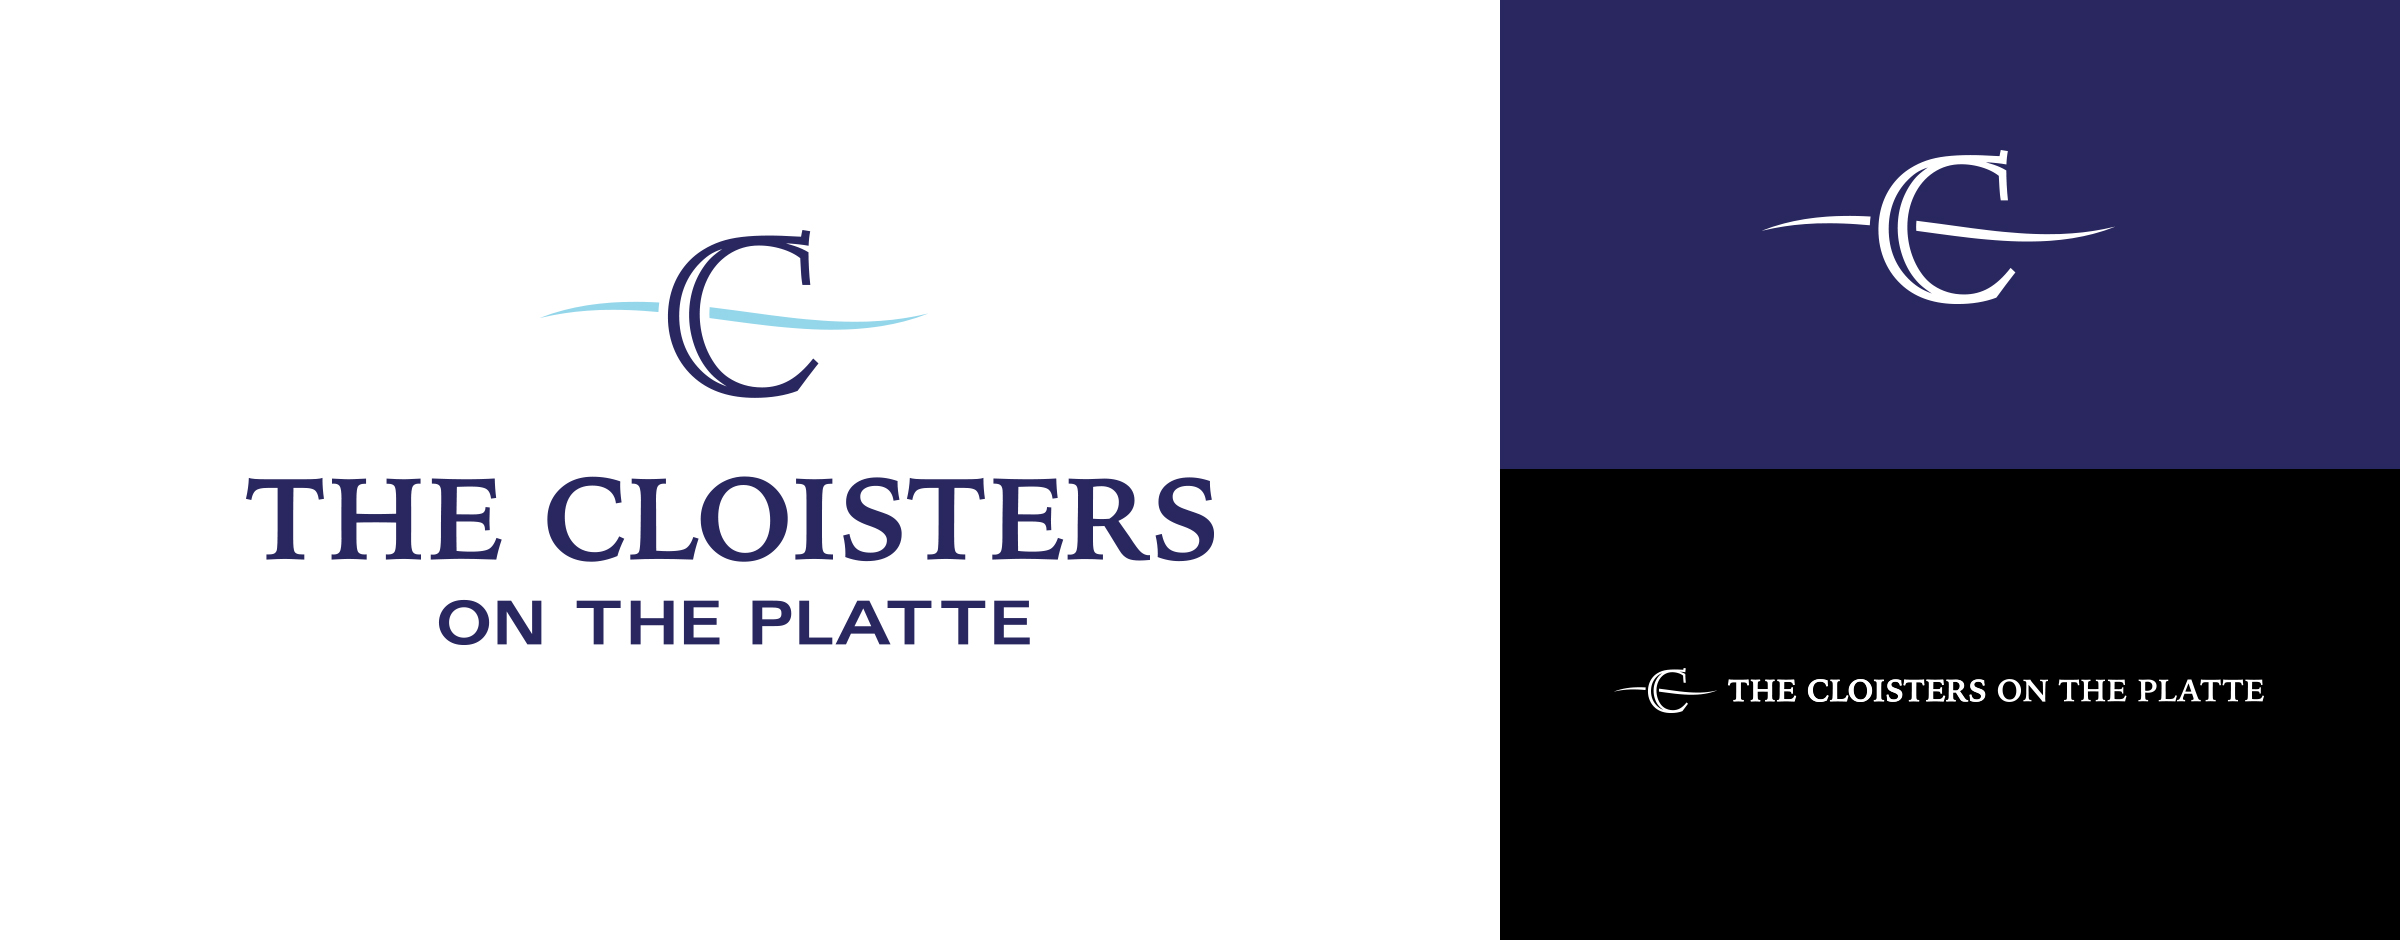 Cloisters logo